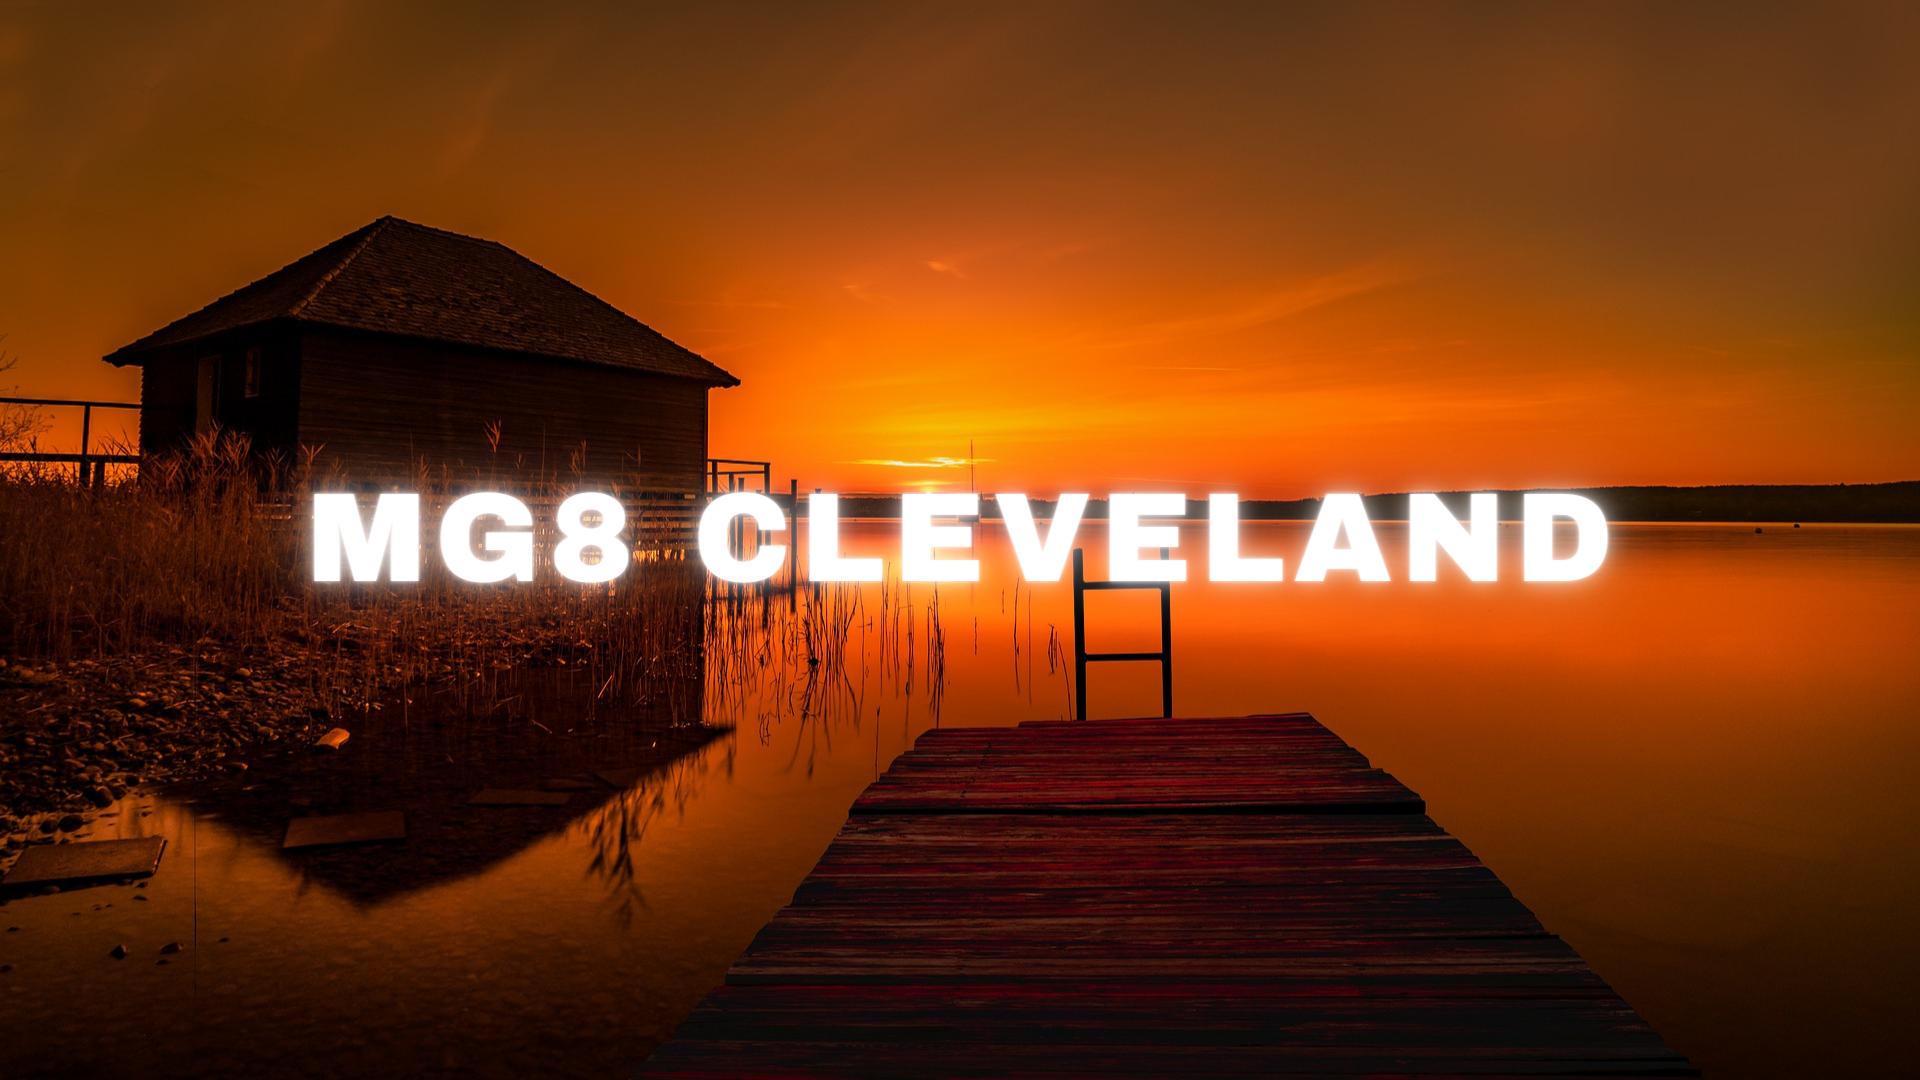 MG8 Cleveland- Home